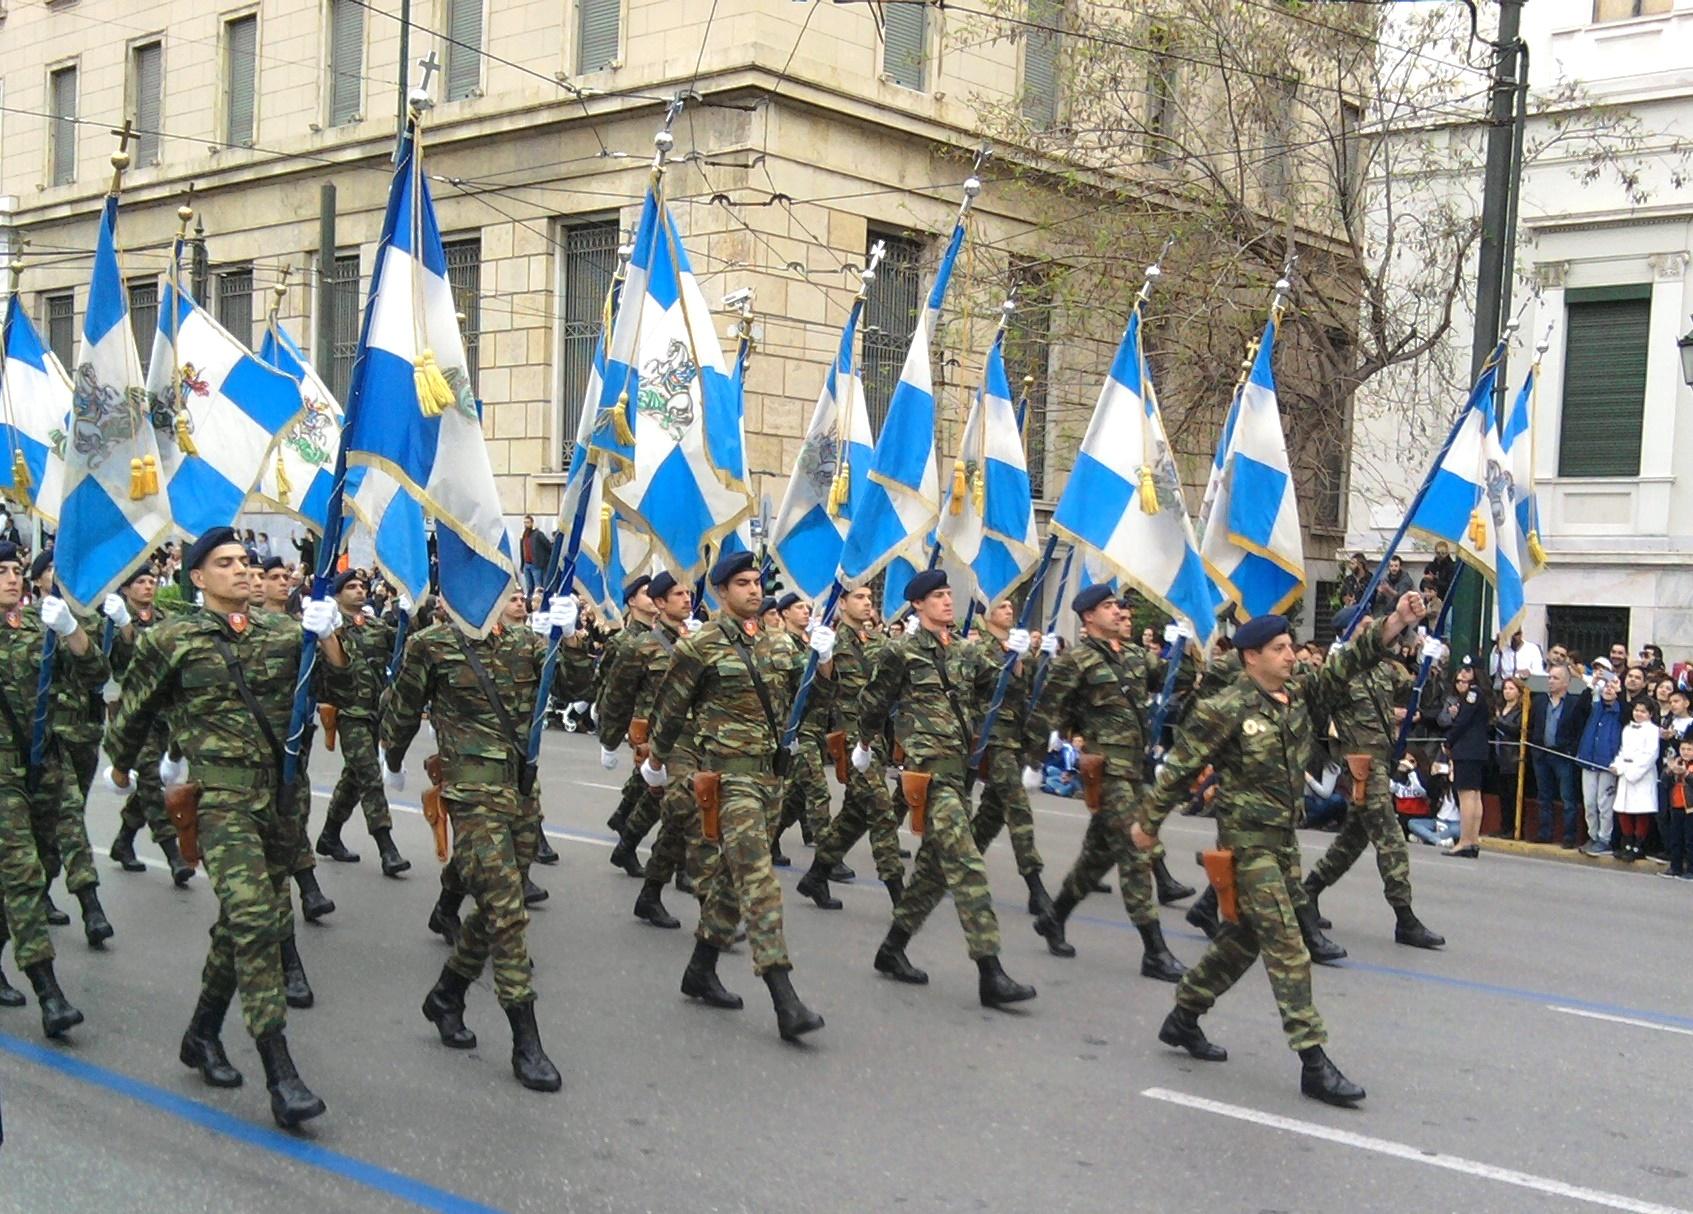 Greek_flags_parade wikipedia.jpg